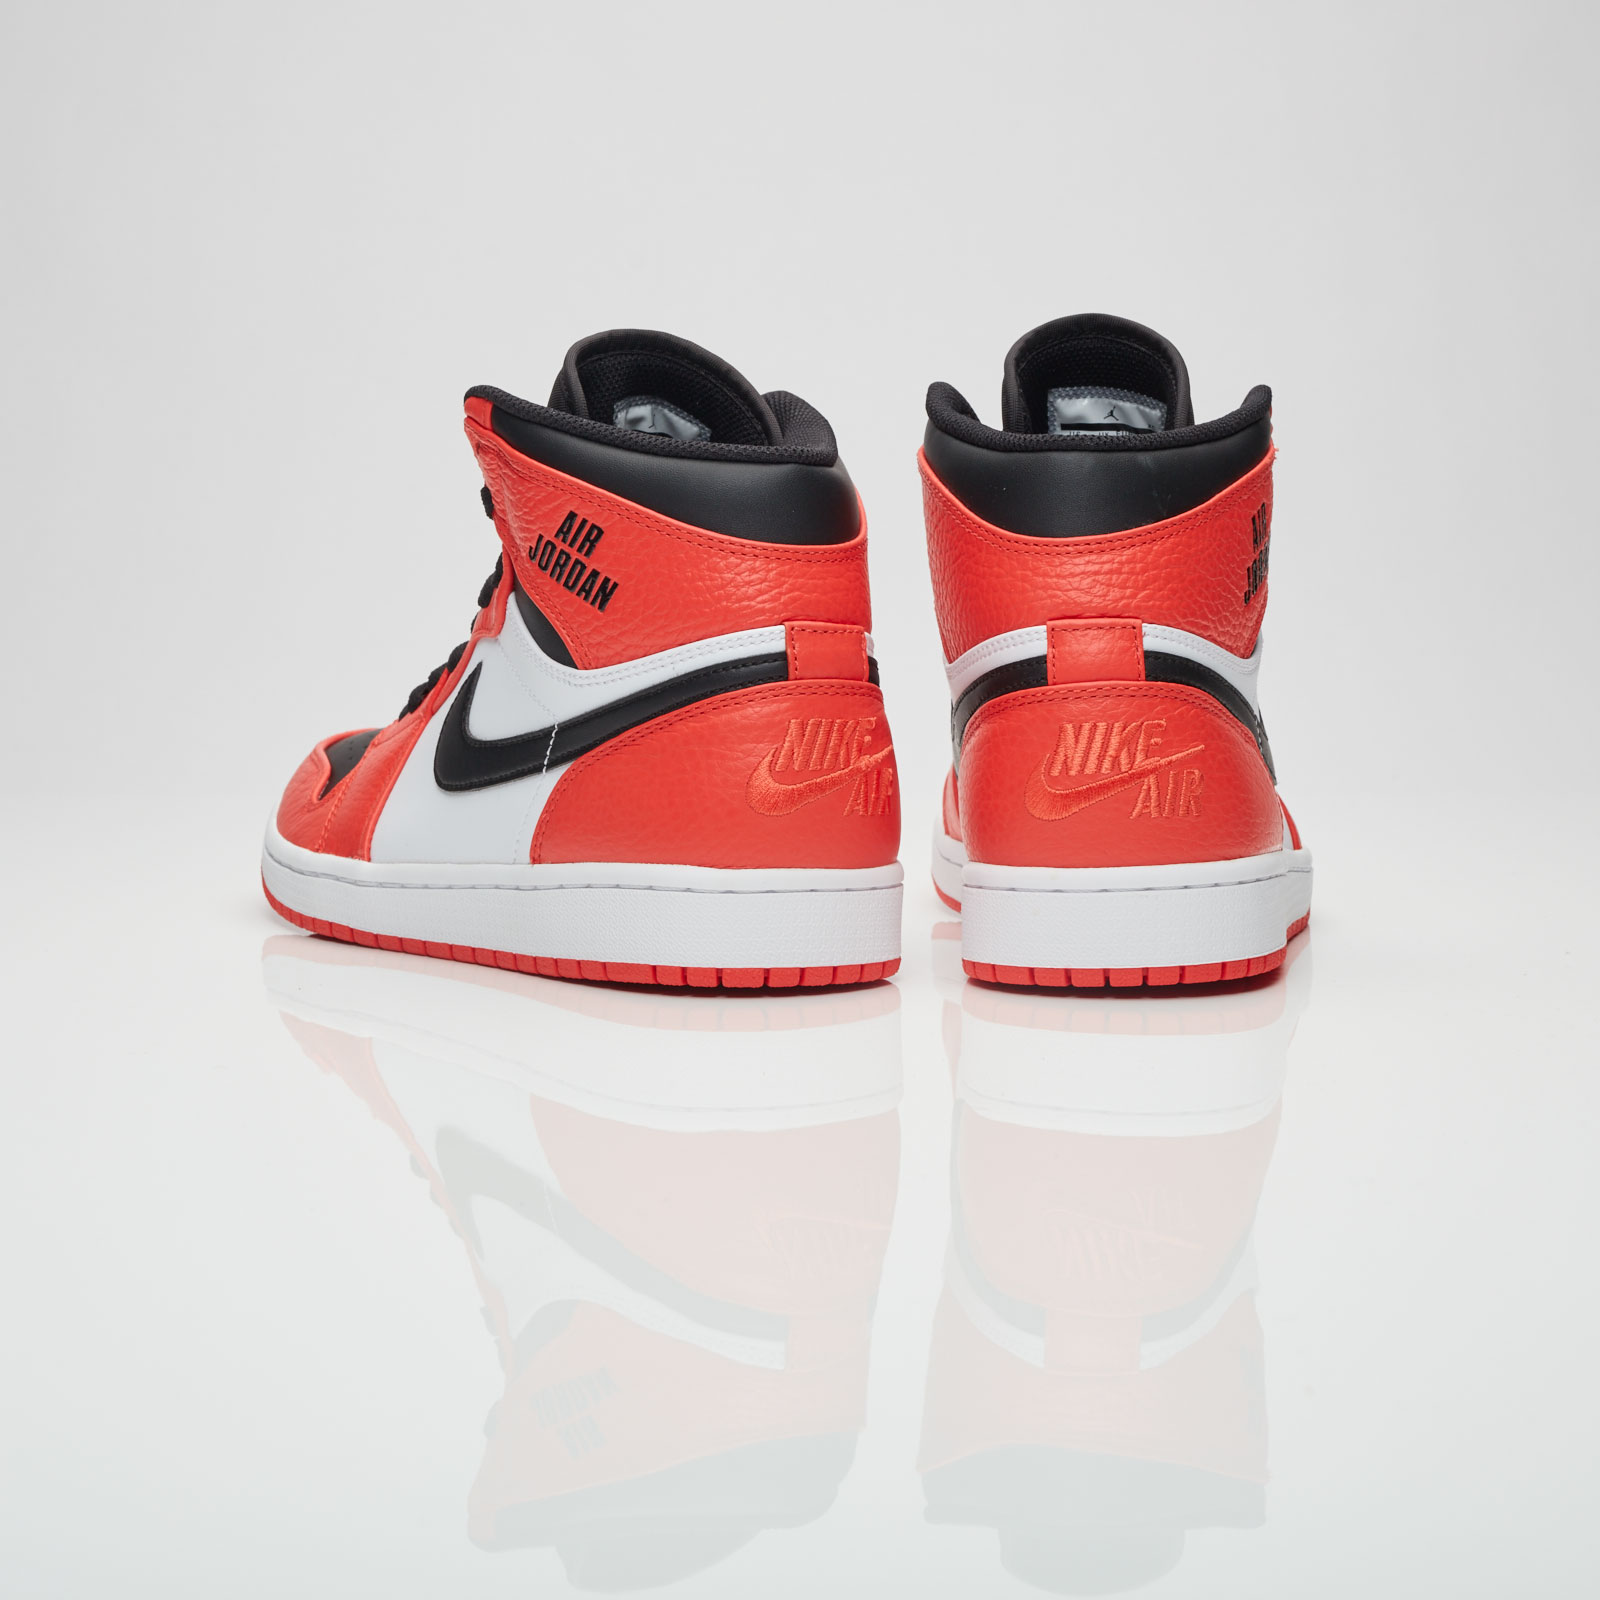 brand new 6a397 2ed3c Jordan Brand Air Jordan 1 Retro High - 332550-800 - Sneakersnstuff    sneakers   streetwear online since 1999